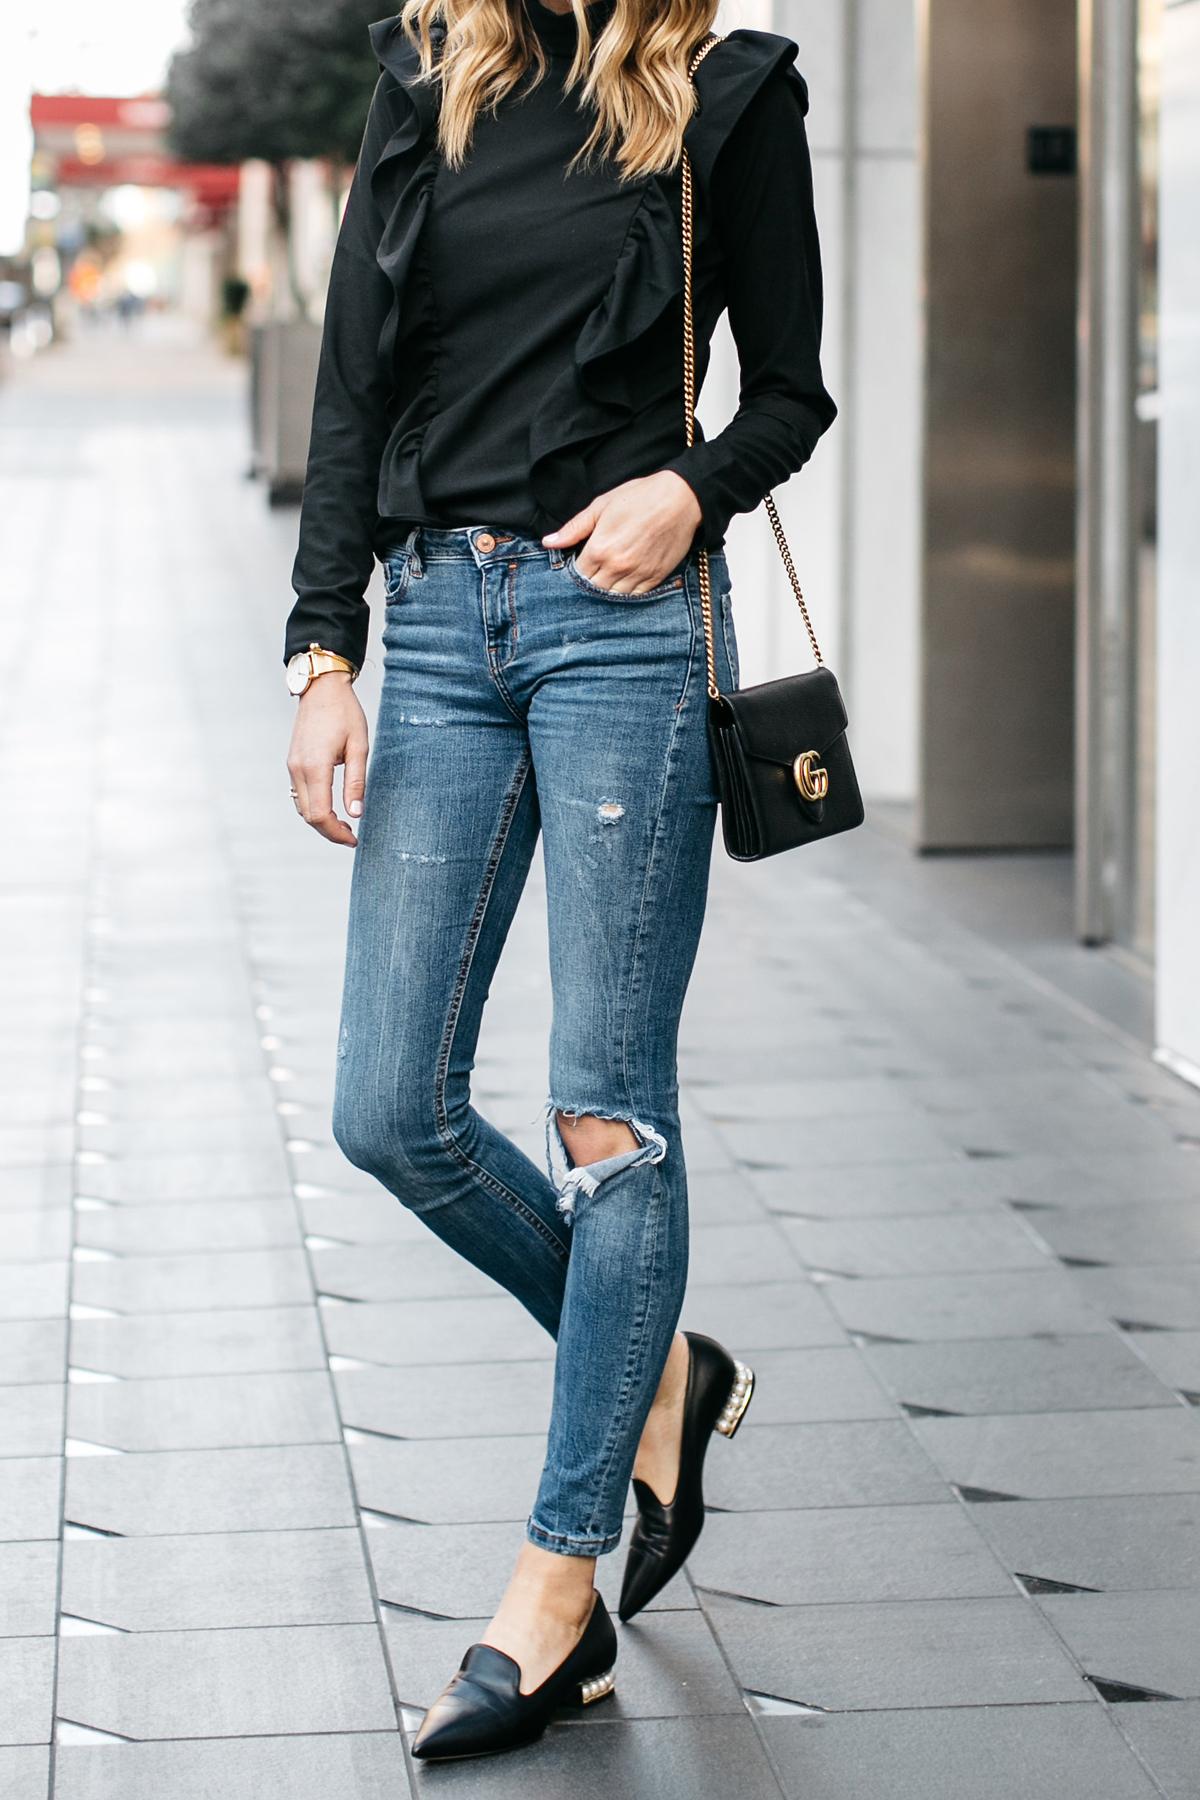 Fashion Jackson, Street Style, Black Long Sleeve Ruffle Top, Denim Ripped Skinny Jeans, Nicholas Kirkwood Pearl Heeled Loafers, Gucci Marmont Handbag